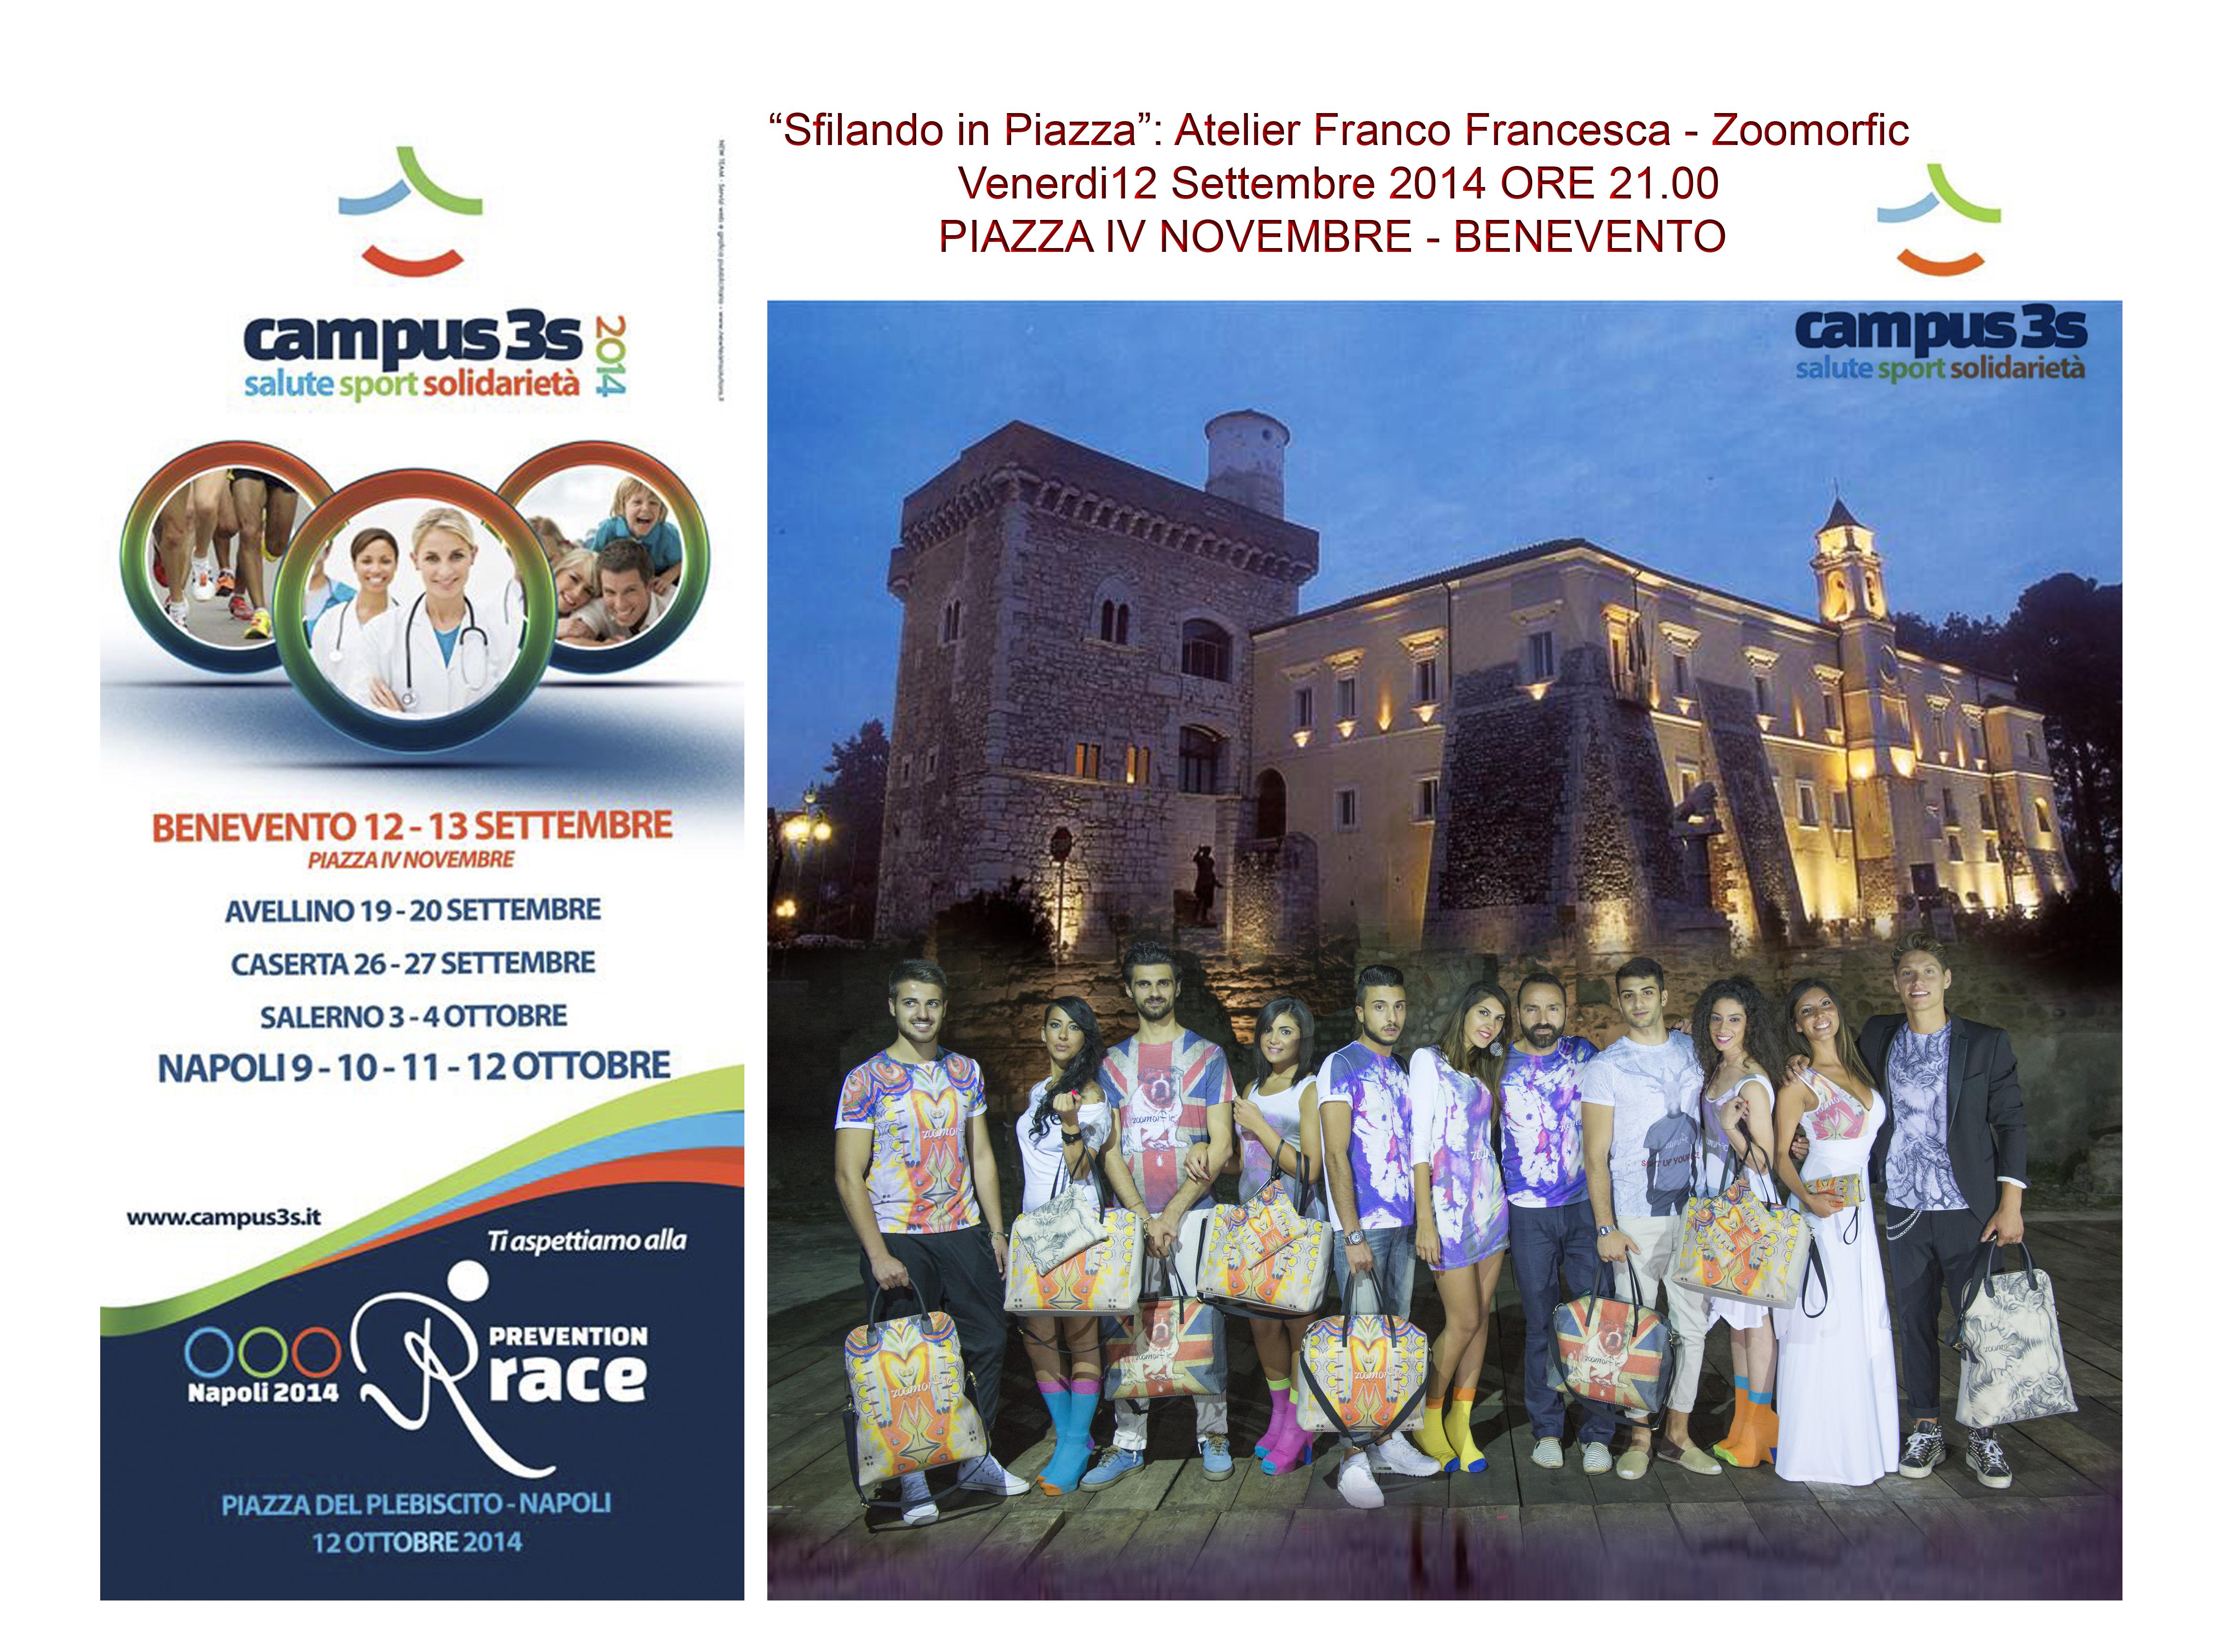 campus3s locandina zoomorfic1